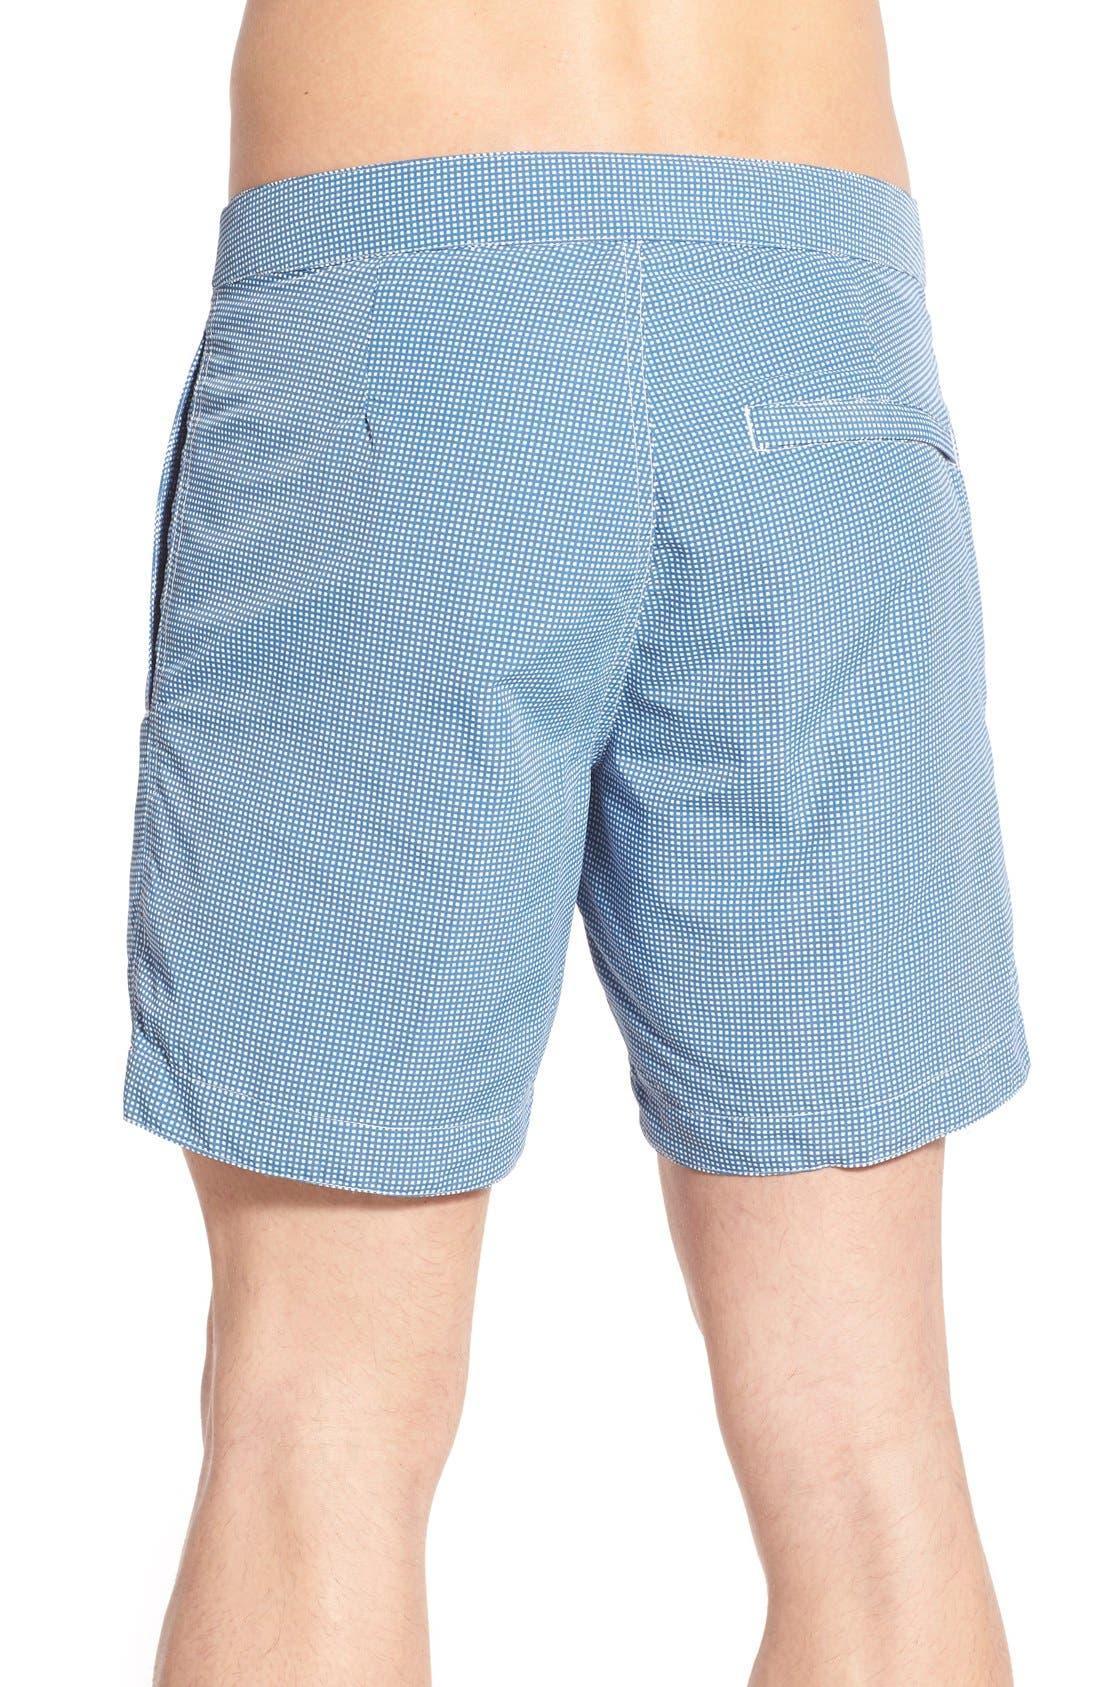 Aruba Tailored Fit Microcheck Swim Trunks,                             Alternate thumbnail 2, color,                             Micro Square Ash Blue